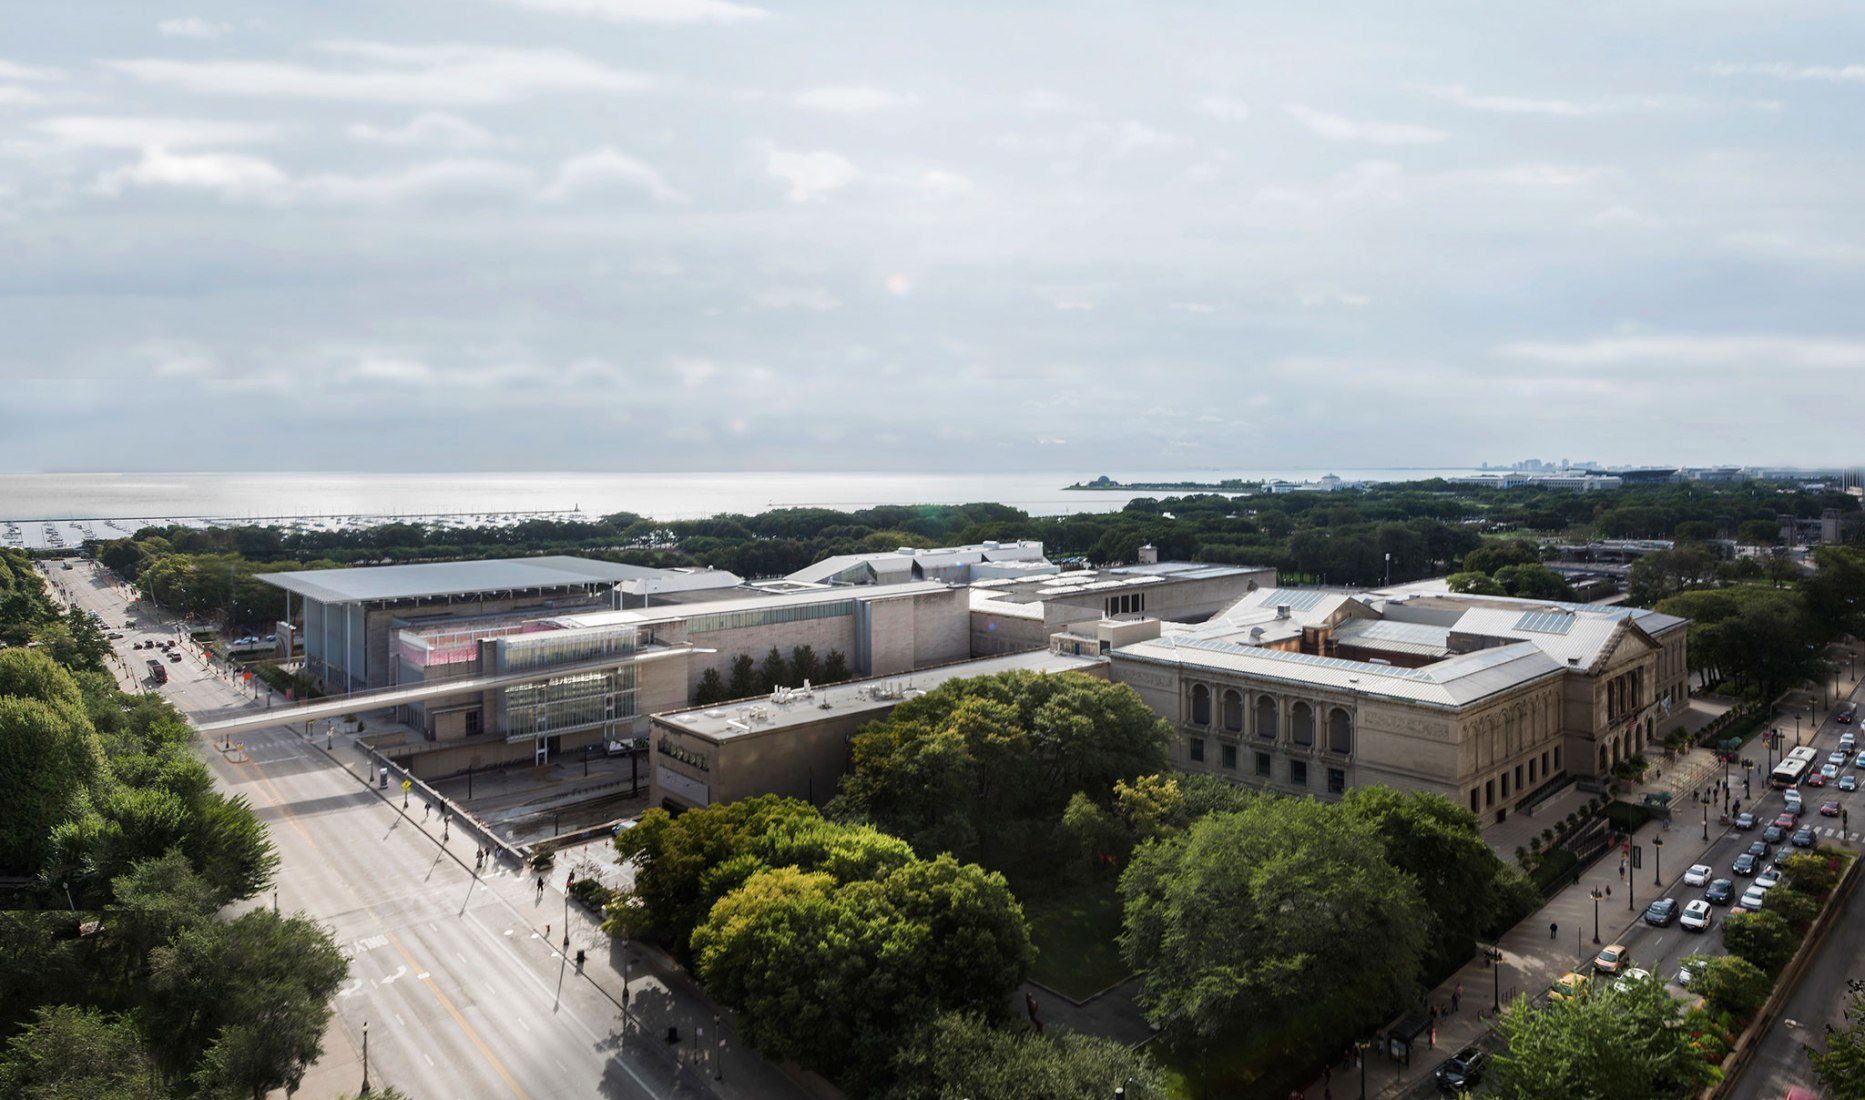 Overview. Art Institute of Chicago. Image courtesy of Barozzi Veiga Architects